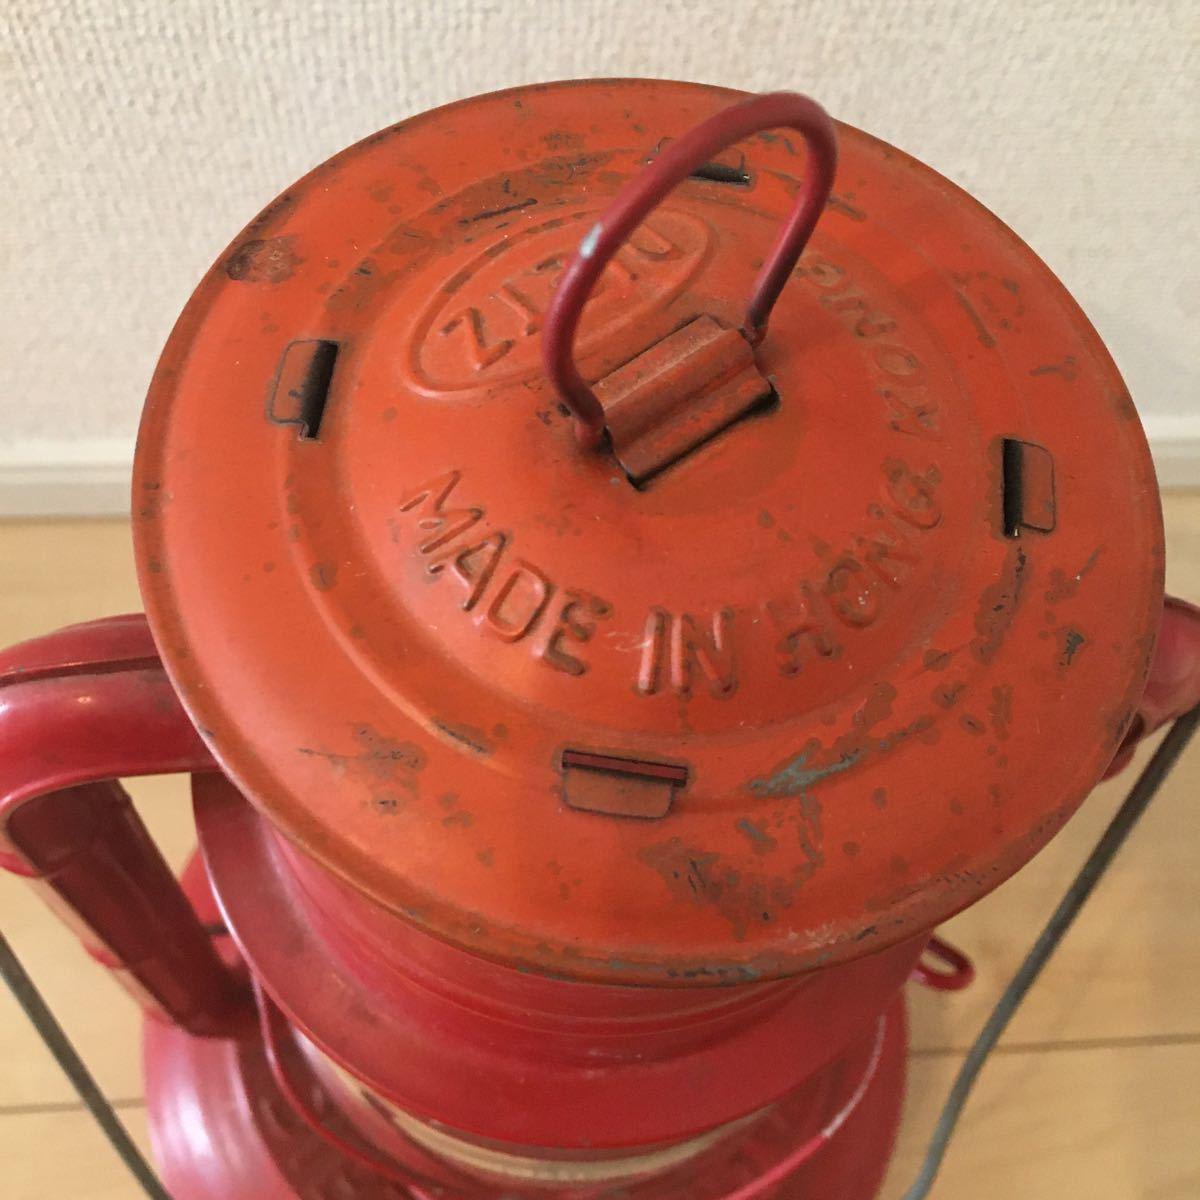 DEIZ デイツ ハリケーンランタン オイルランプ ランタン 灯油ランプ Jupiter 2500 ジュピター